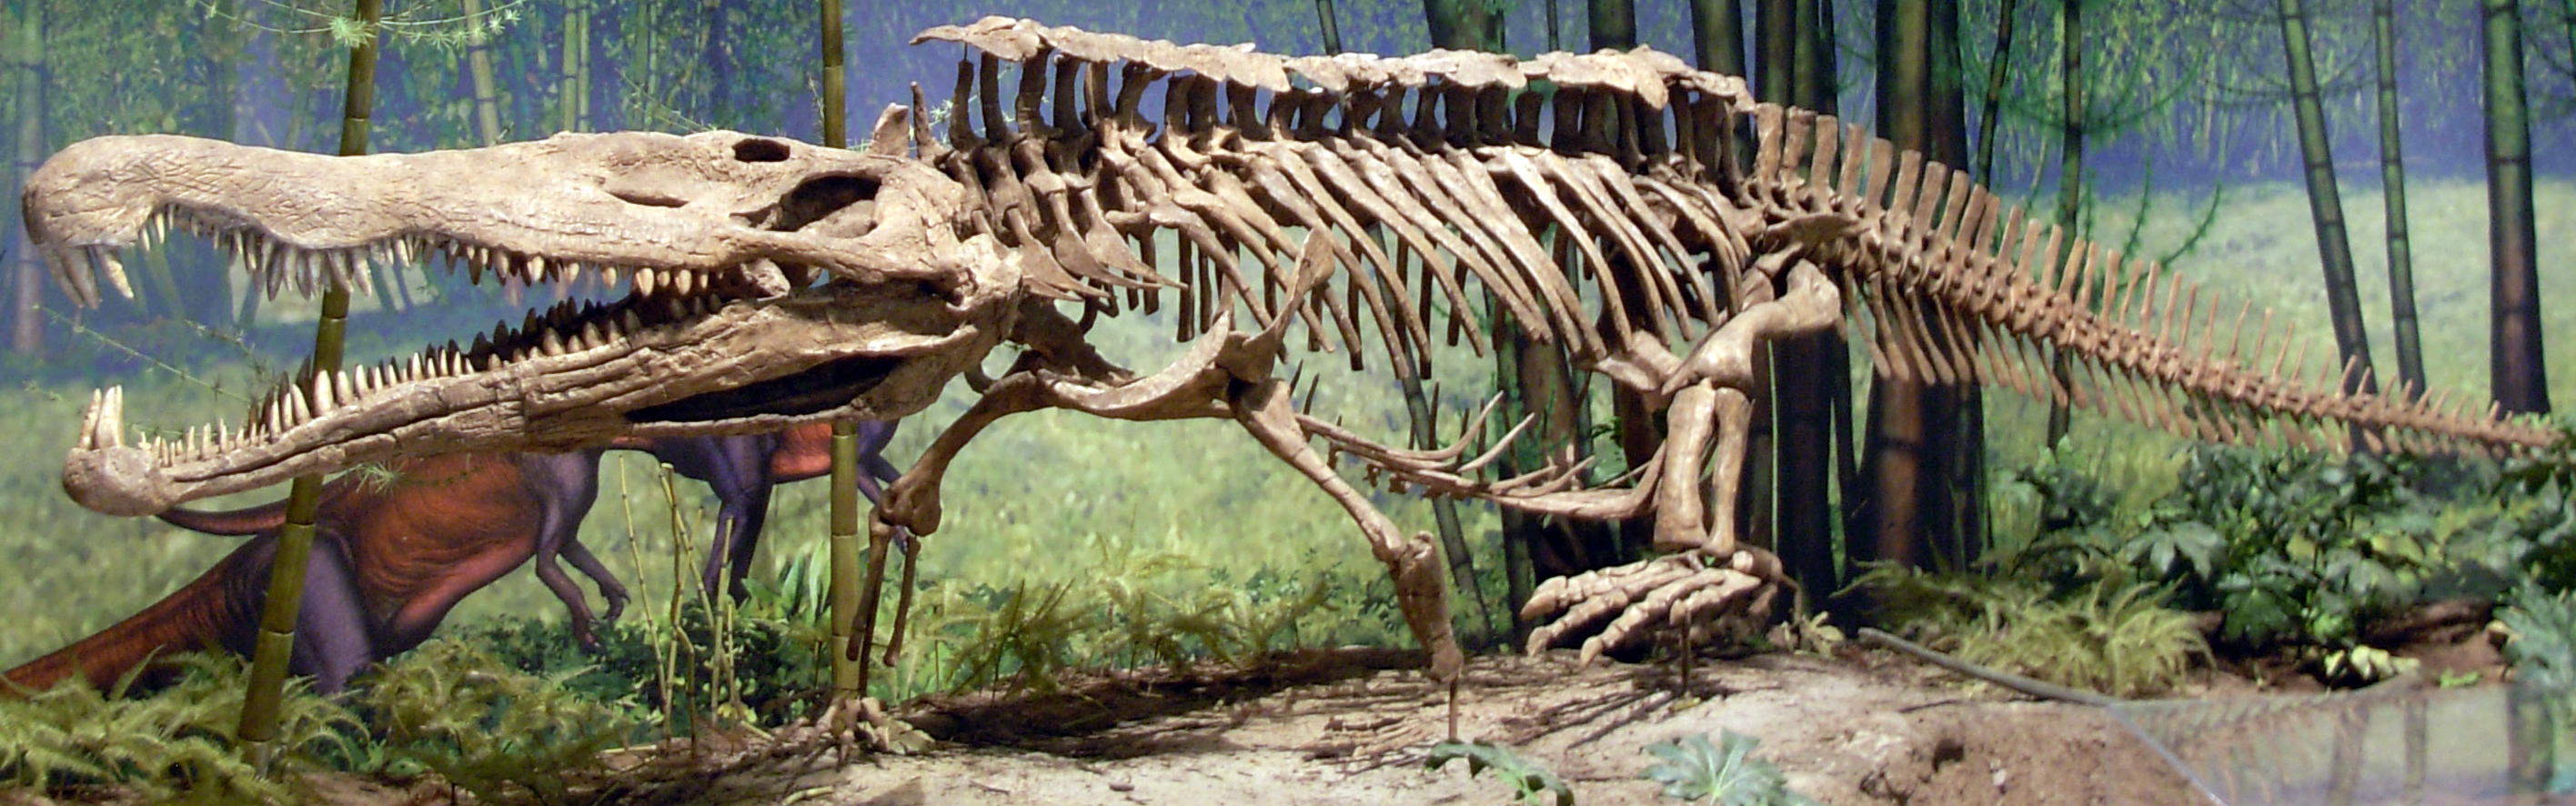 Redondasaurus_bermani_at_CMNH_04.jpg